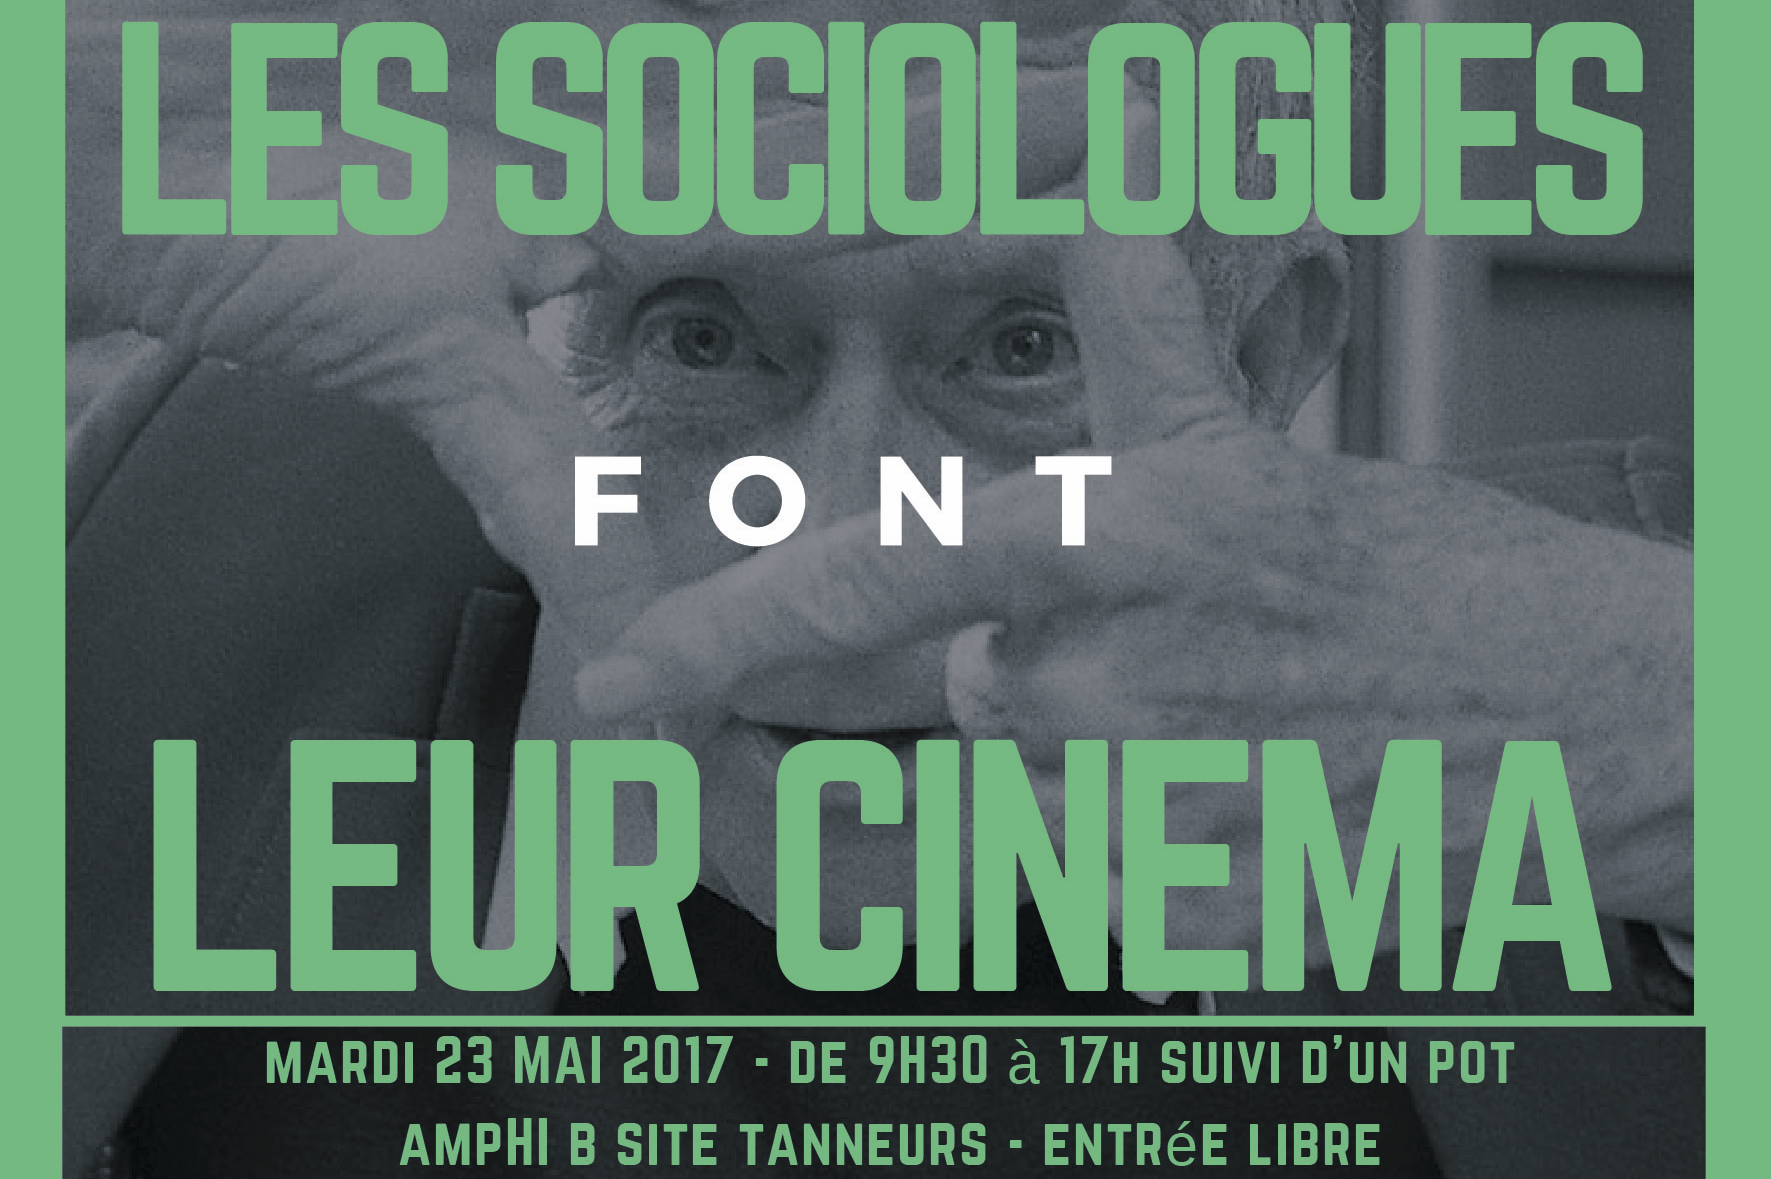 150x100_Les sociologues-font leur cinéma.png